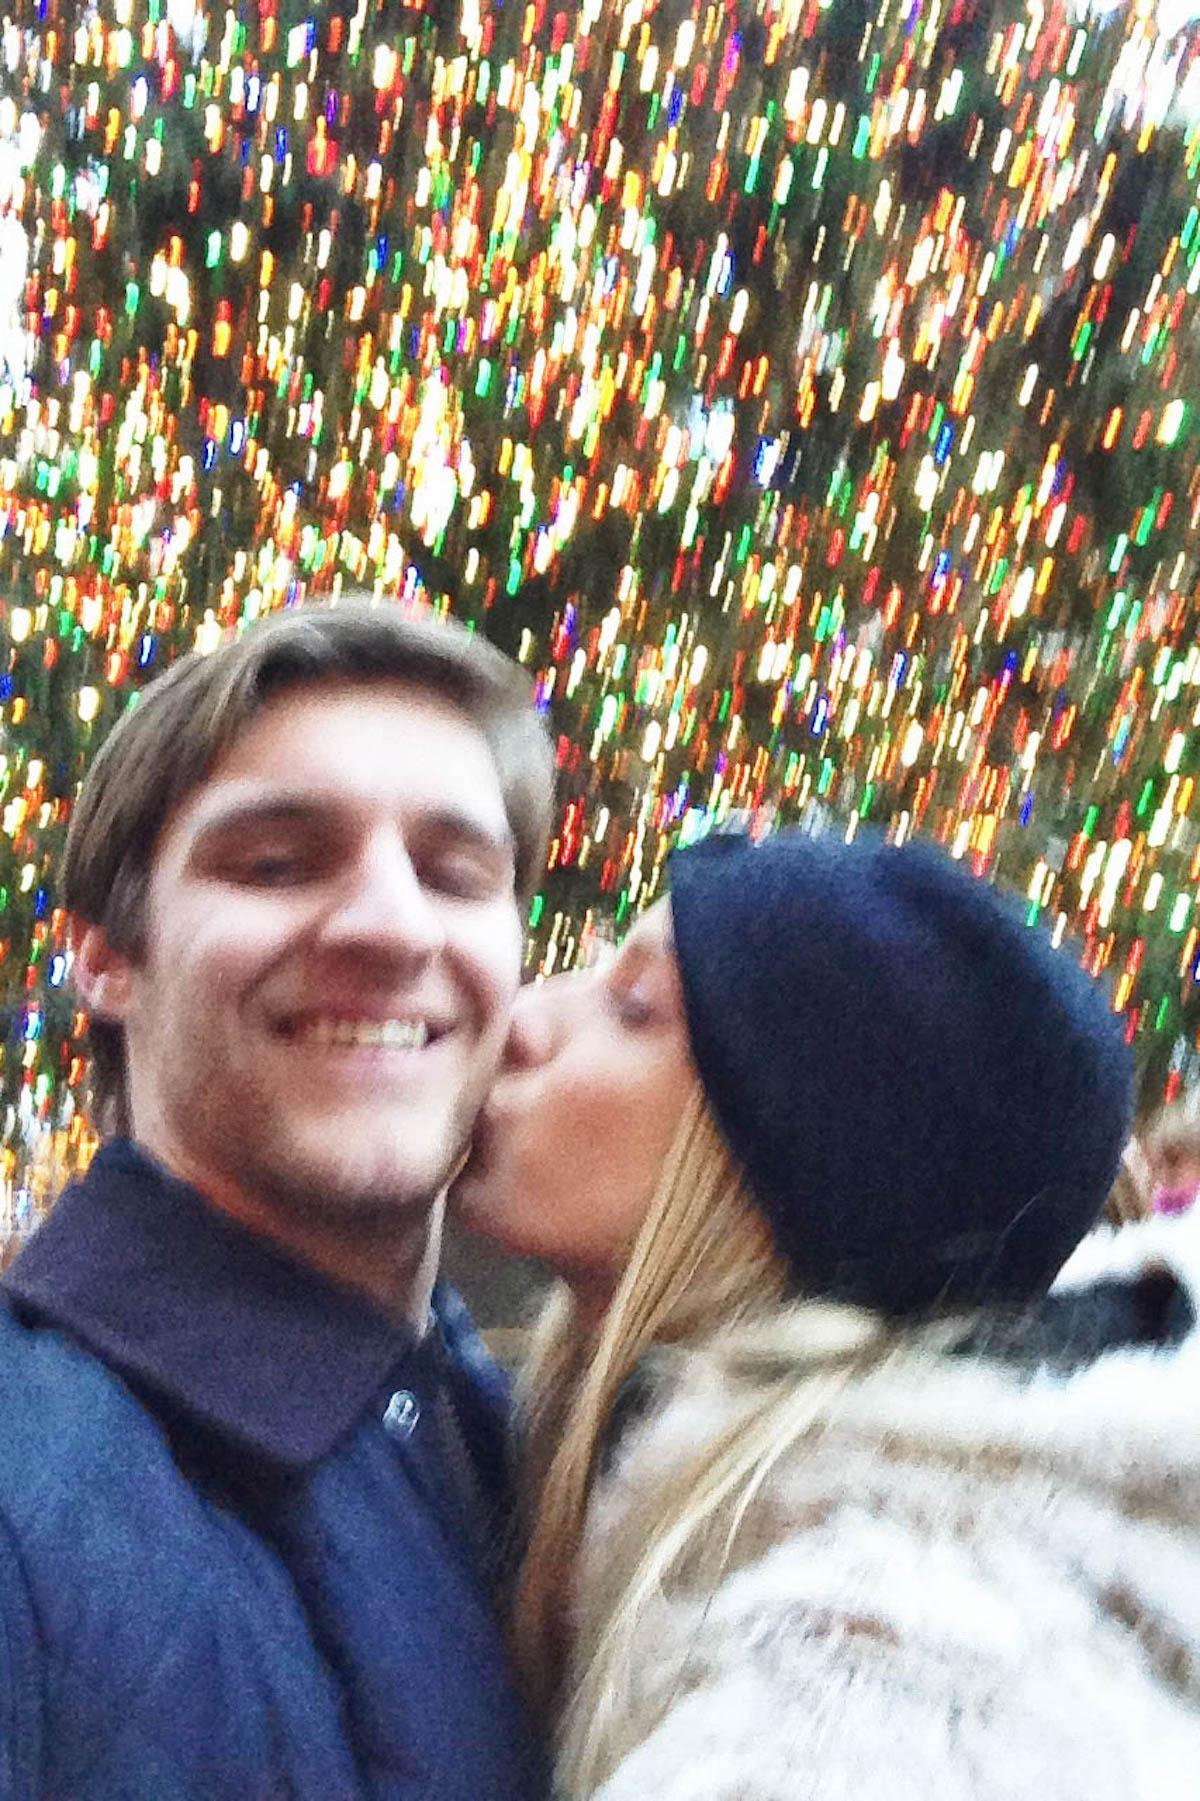 Rockefeller Center Christmas Tree | New York City Holiday Guide